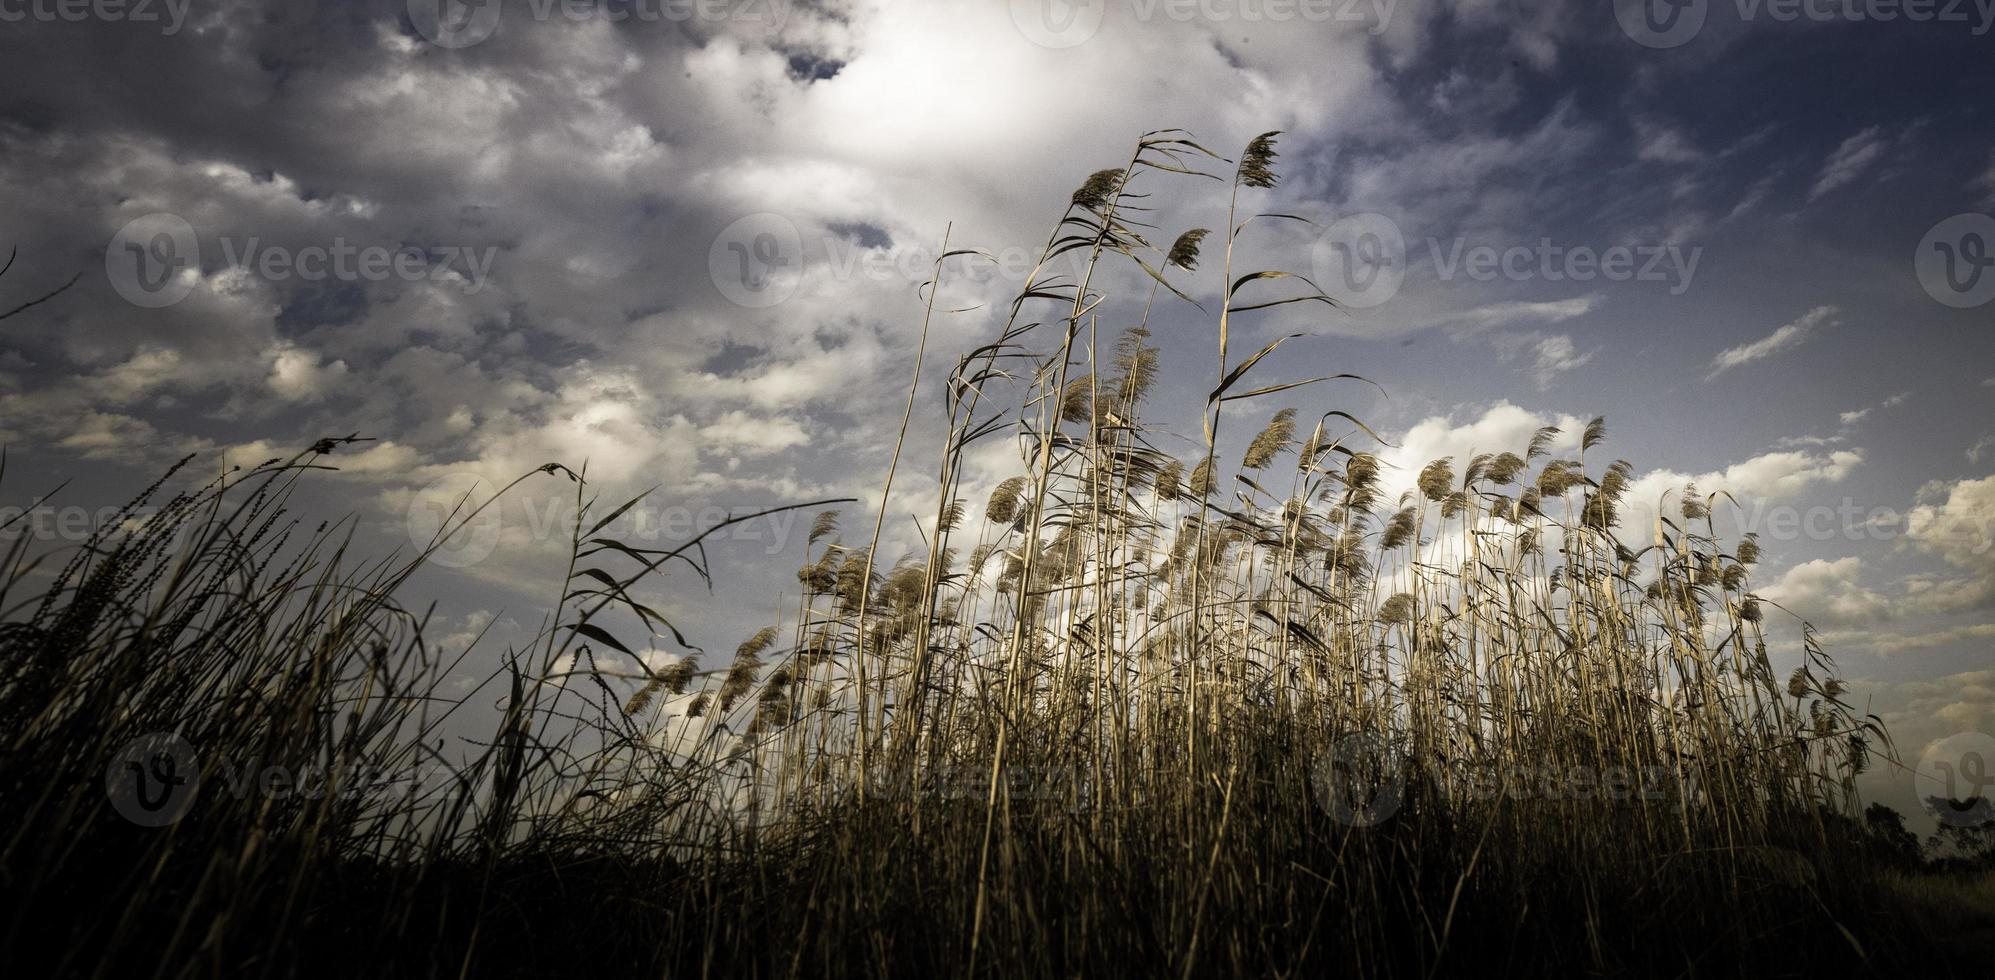 berwick lake melbourne foto